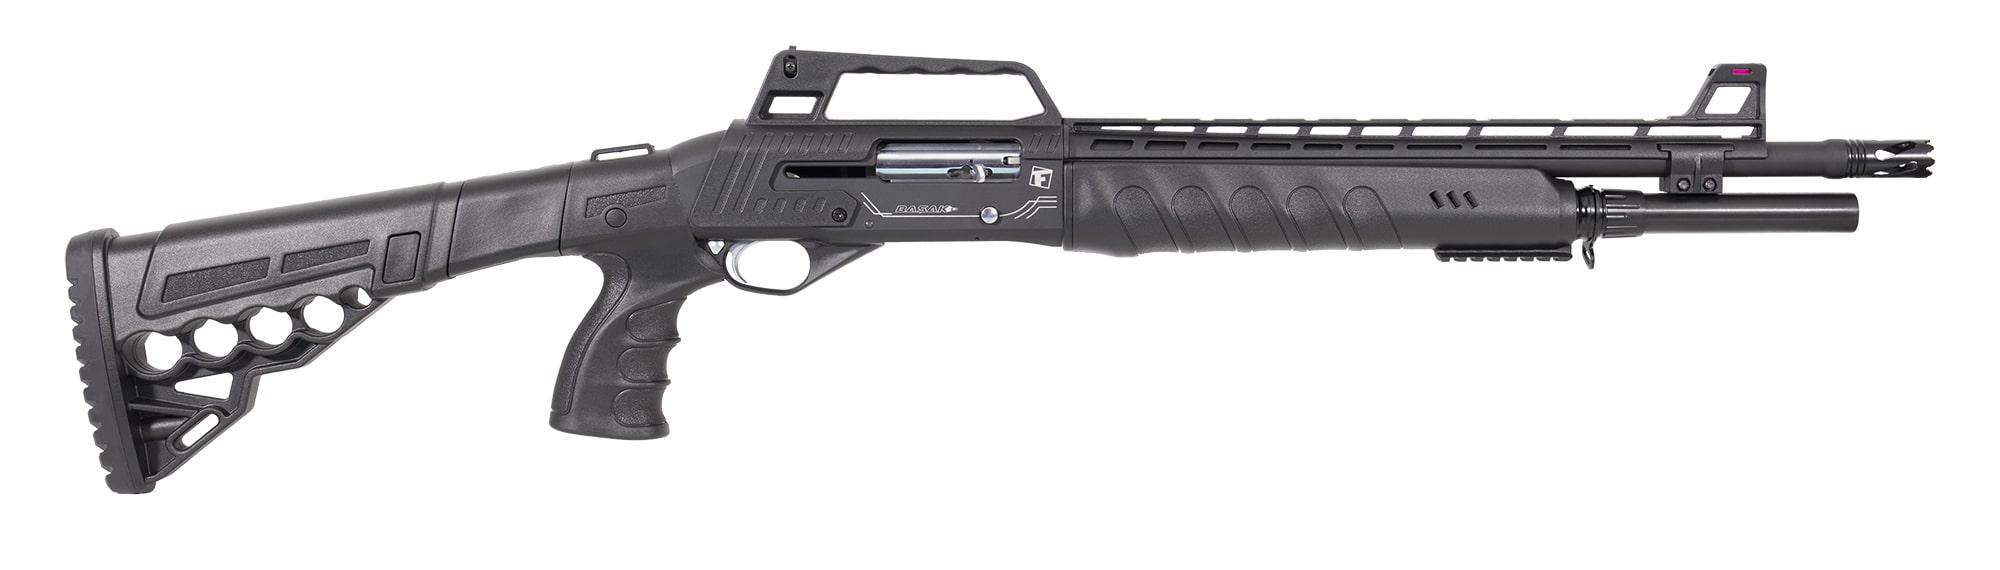 Basak F610 Black Tactical